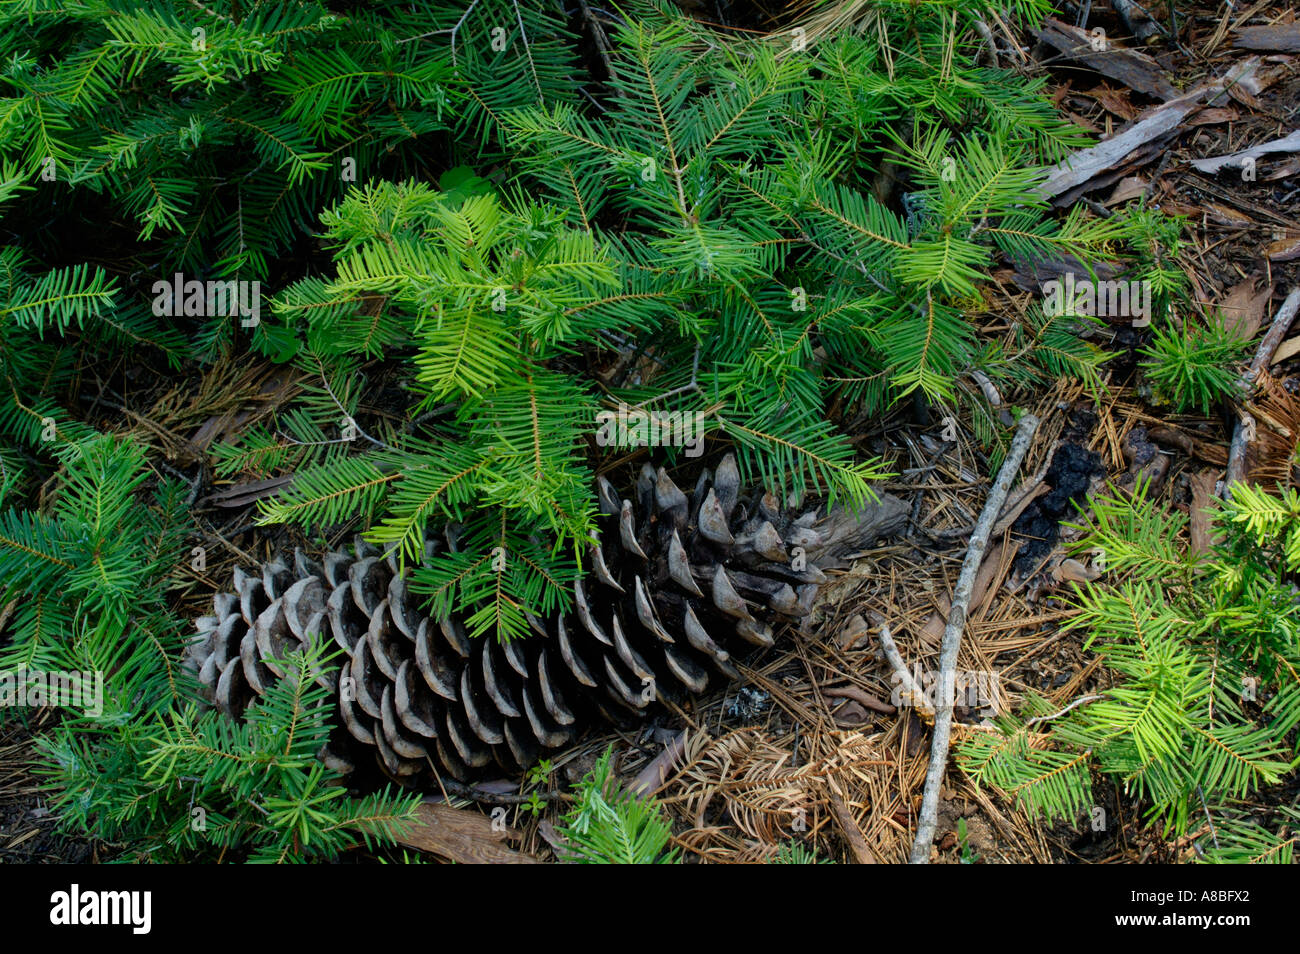 Small Sequoia Tree Stock Photos & Small Sequoia Tree Stock ...